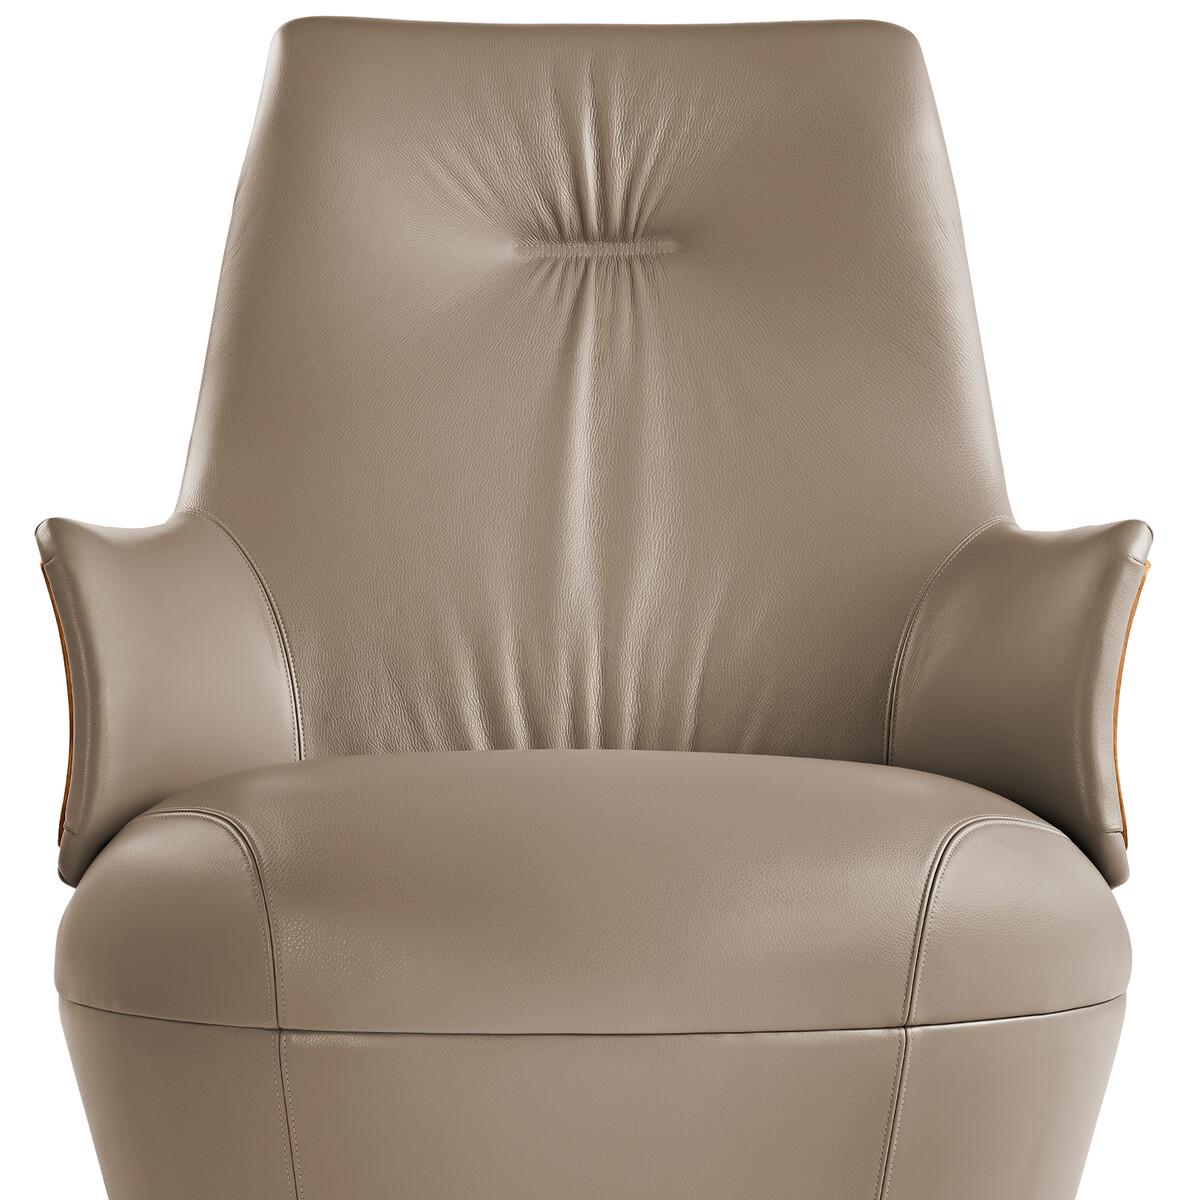 poltrona frau assaya drehbarer sessel casa de. Black Bedroom Furniture Sets. Home Design Ideas